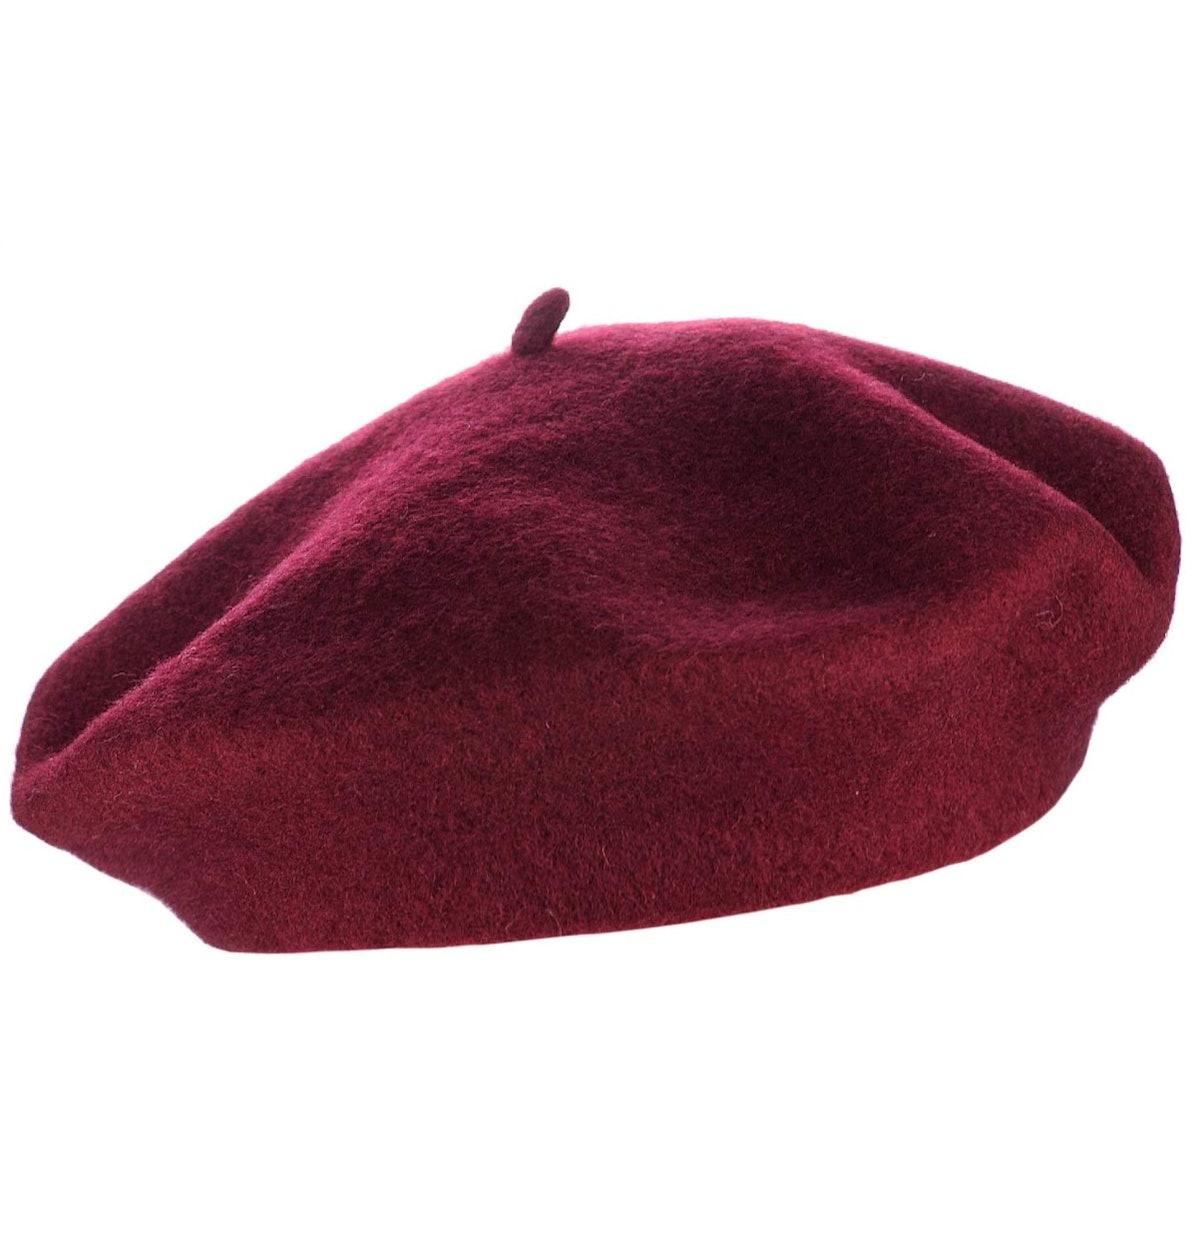 NYFASHION101 Classic Wool Beret